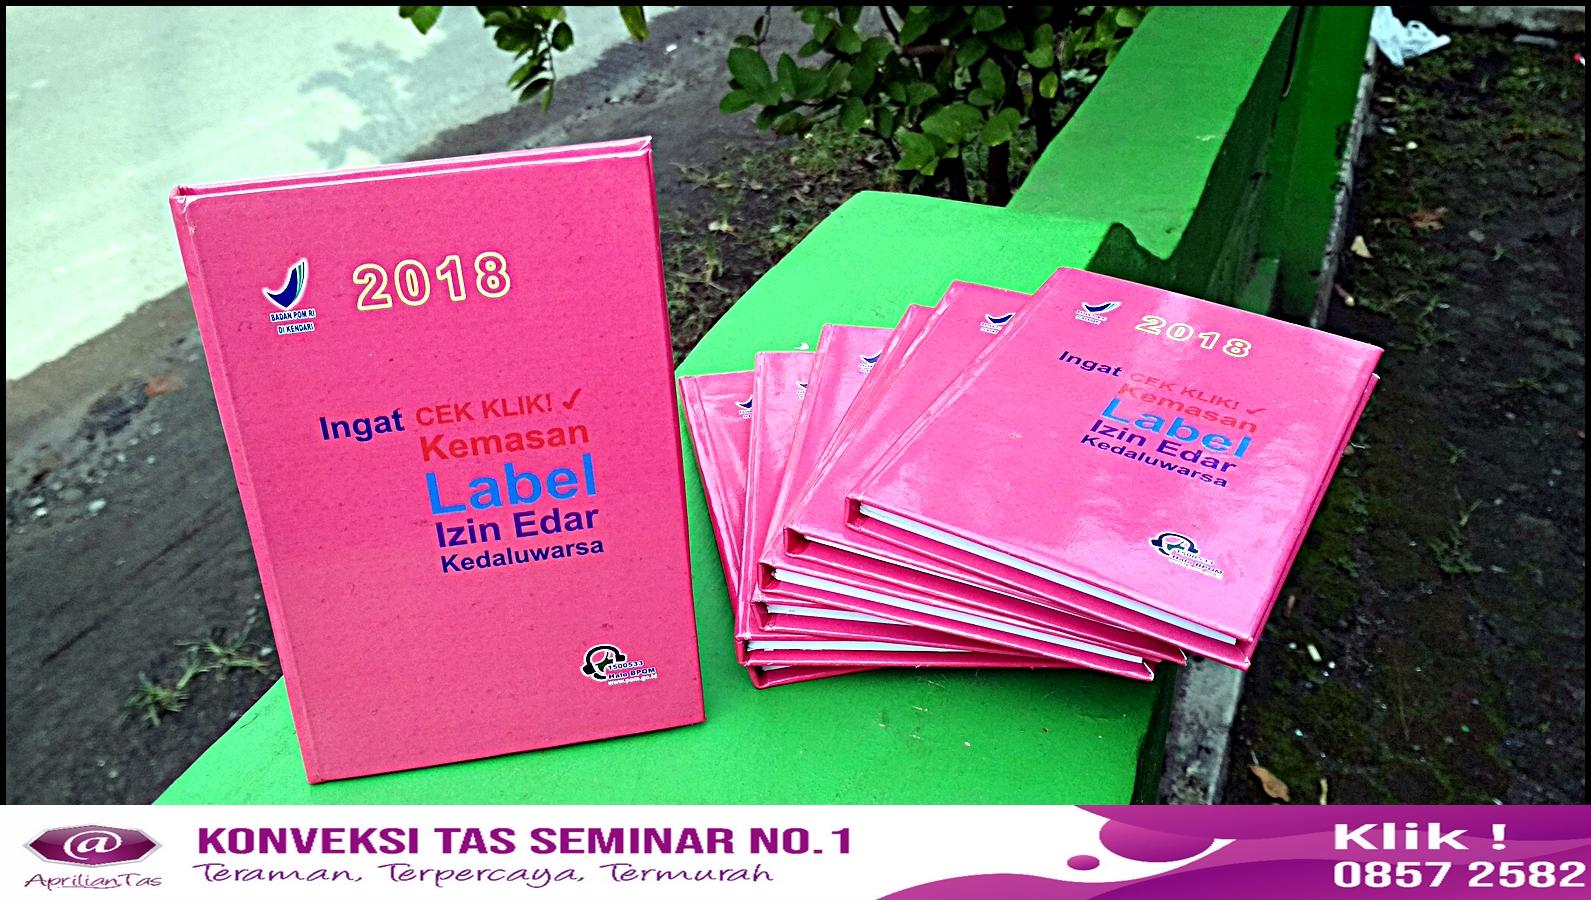 Pengrajin Tas Seminar Ransel Bandung yang Menyediakan Paket Seminar Kit  Tas untuk acara seminar,tas seminar batik jogja,tas seminar batik murah,